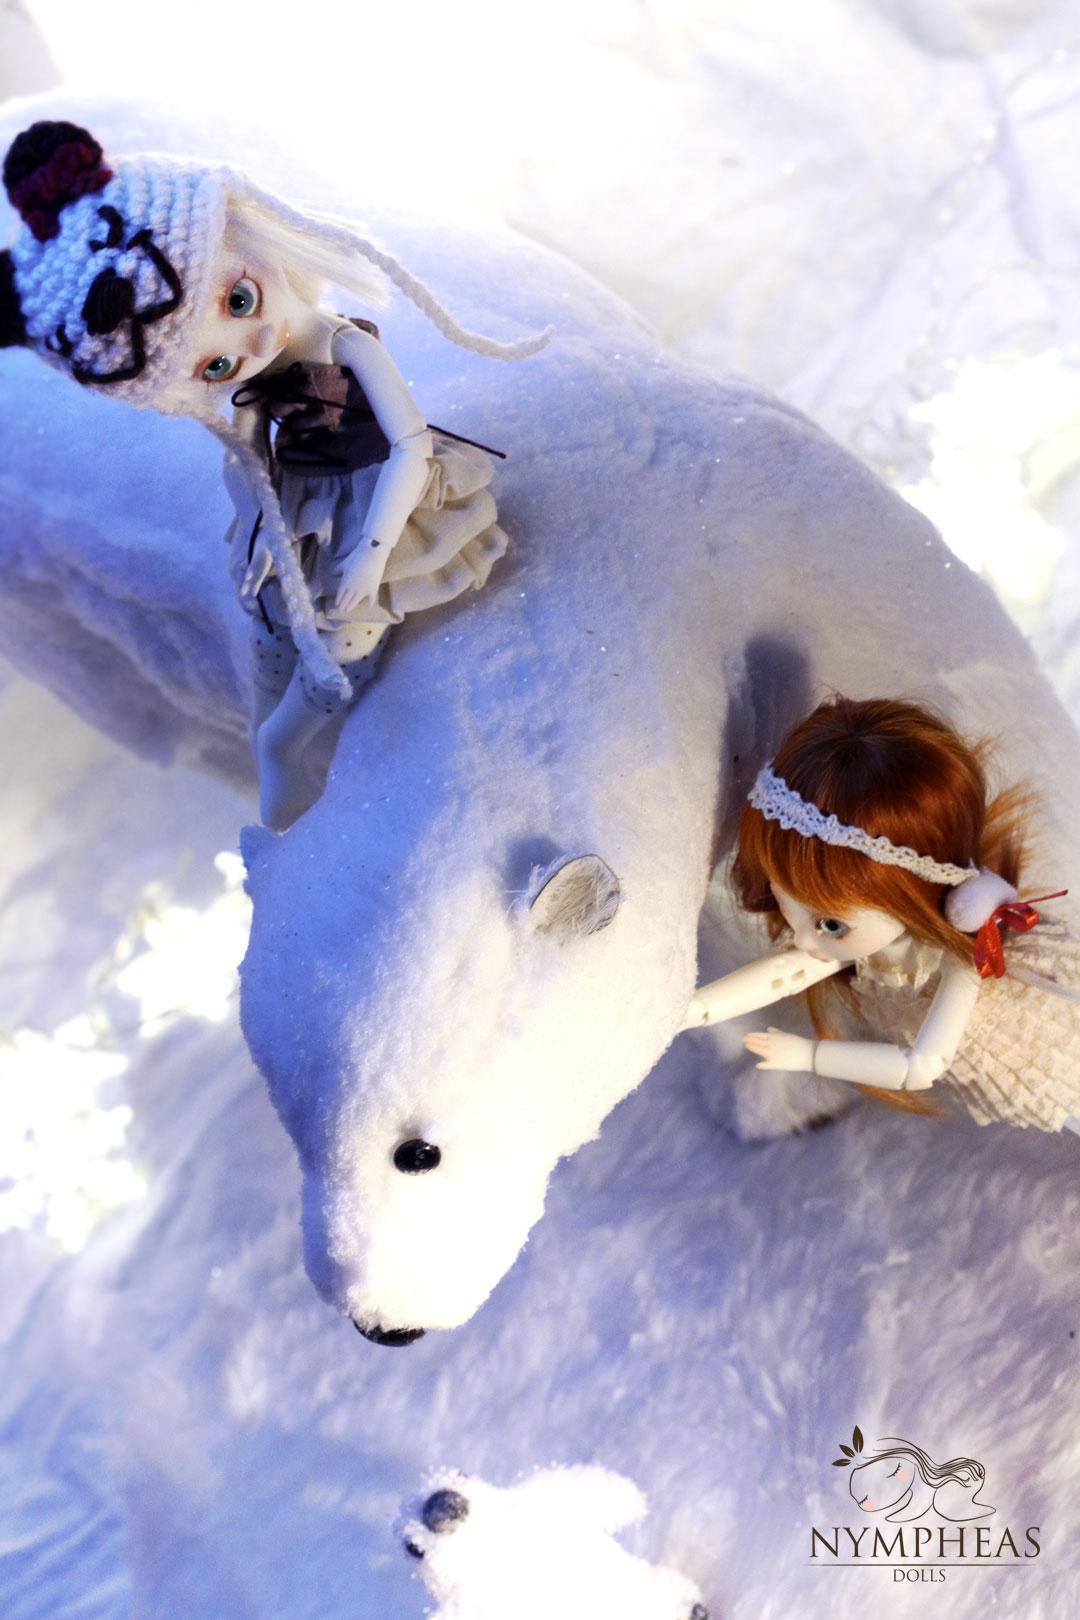 [NYMPHEAS DOLLS] Tit'herbe & Tit'Fleur Snow P35 - Page 4 Nymphette-nympheline-snow-nympheas-dolls-bjd-k6051